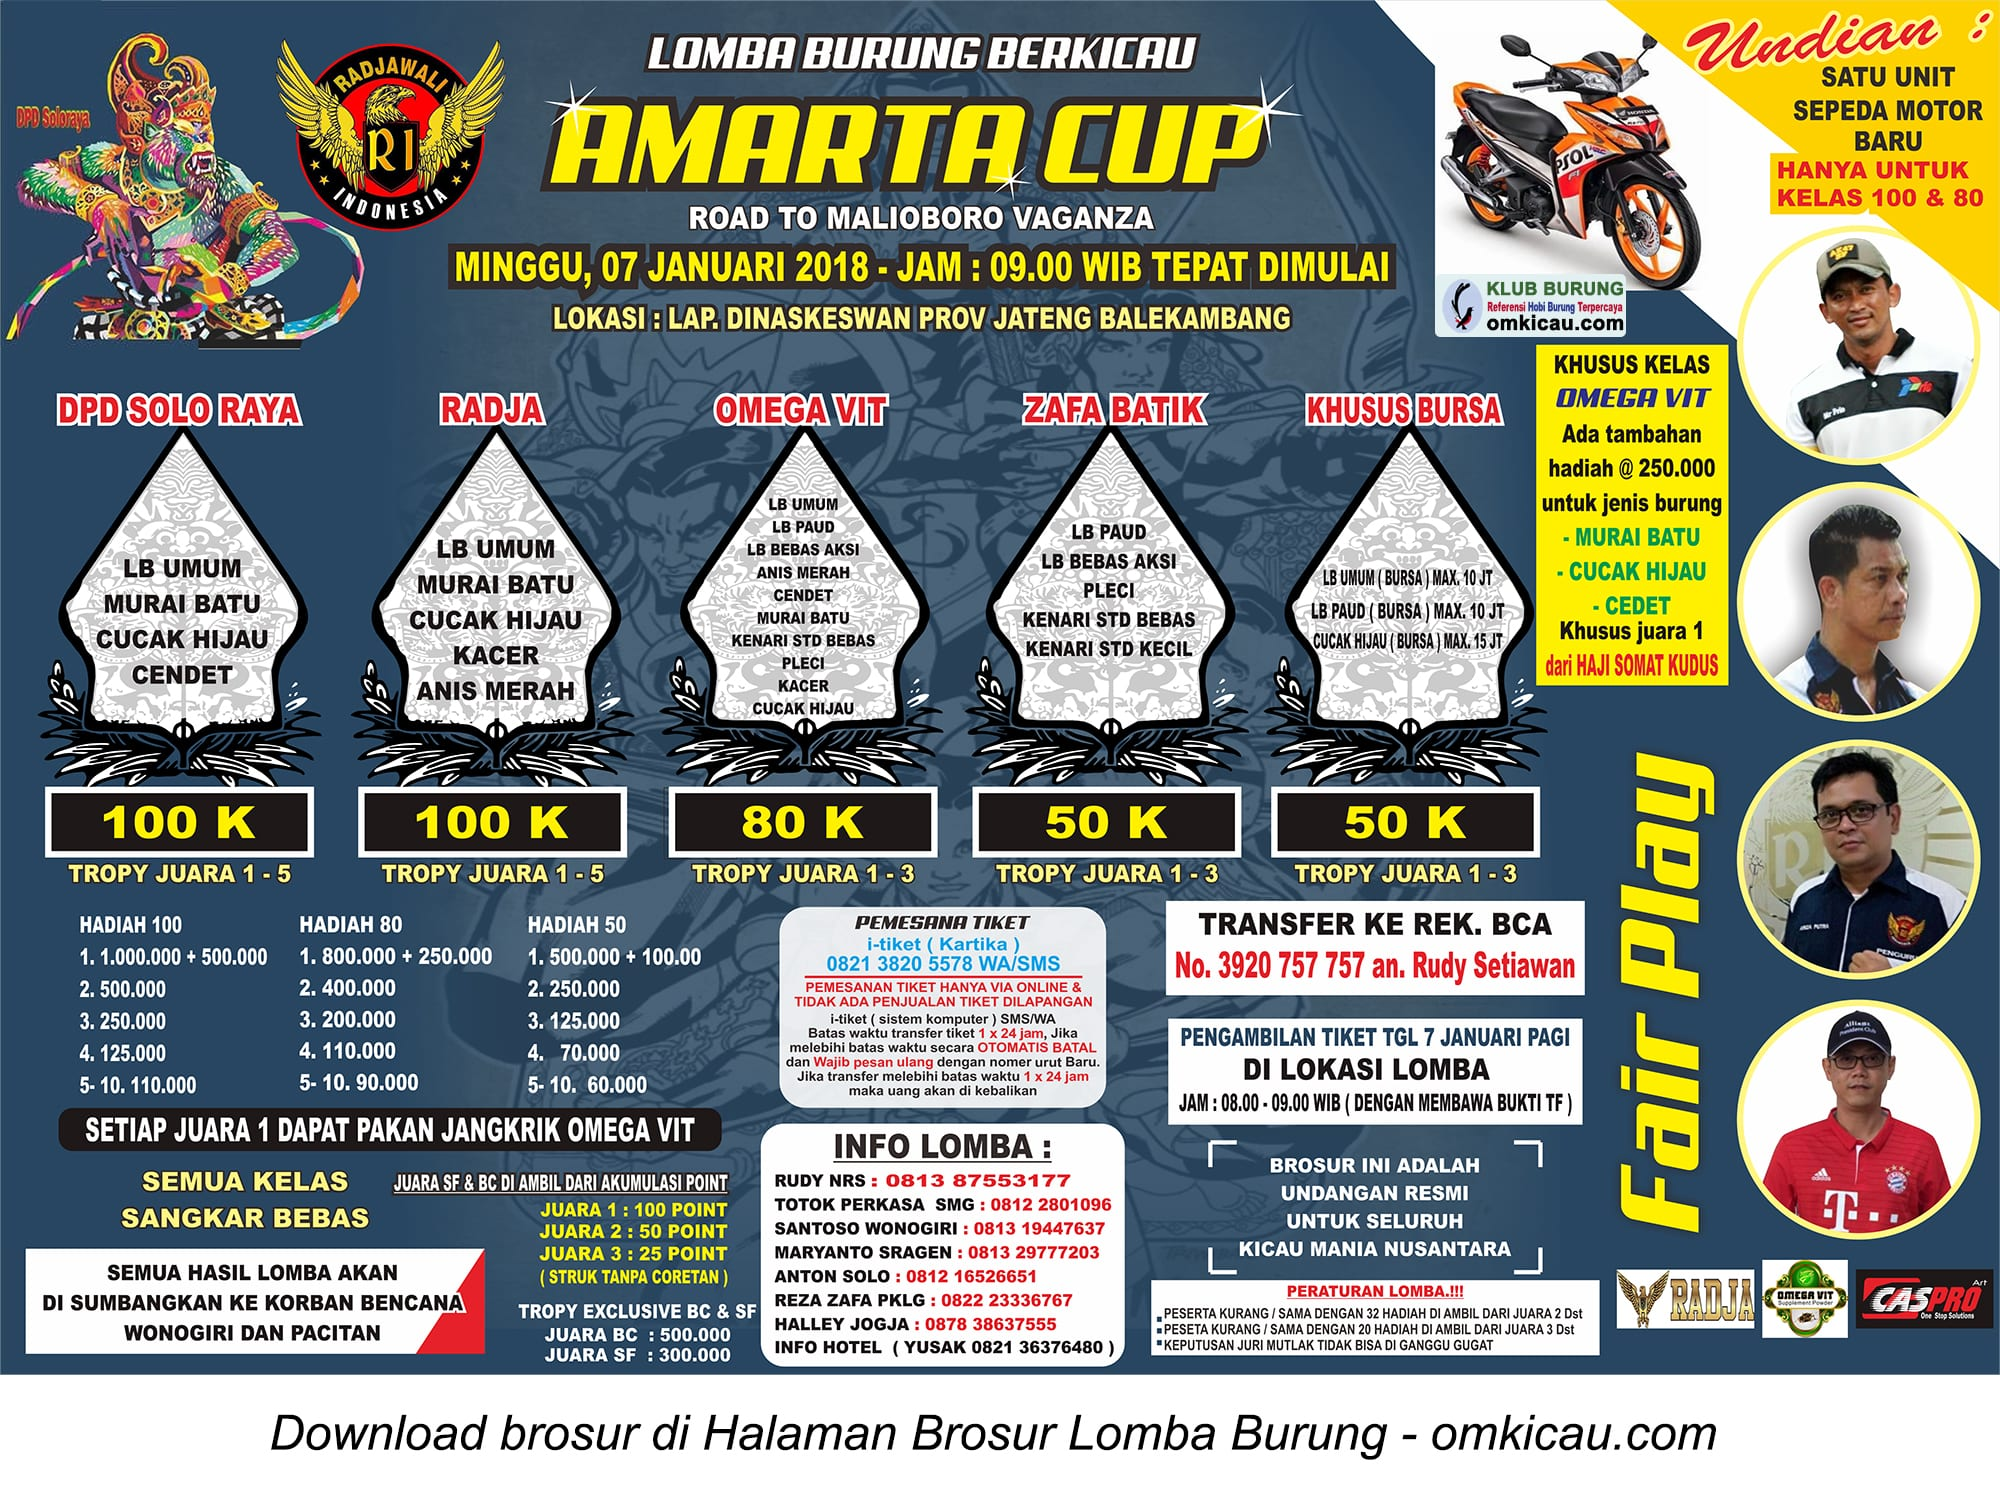 Amarta Cup